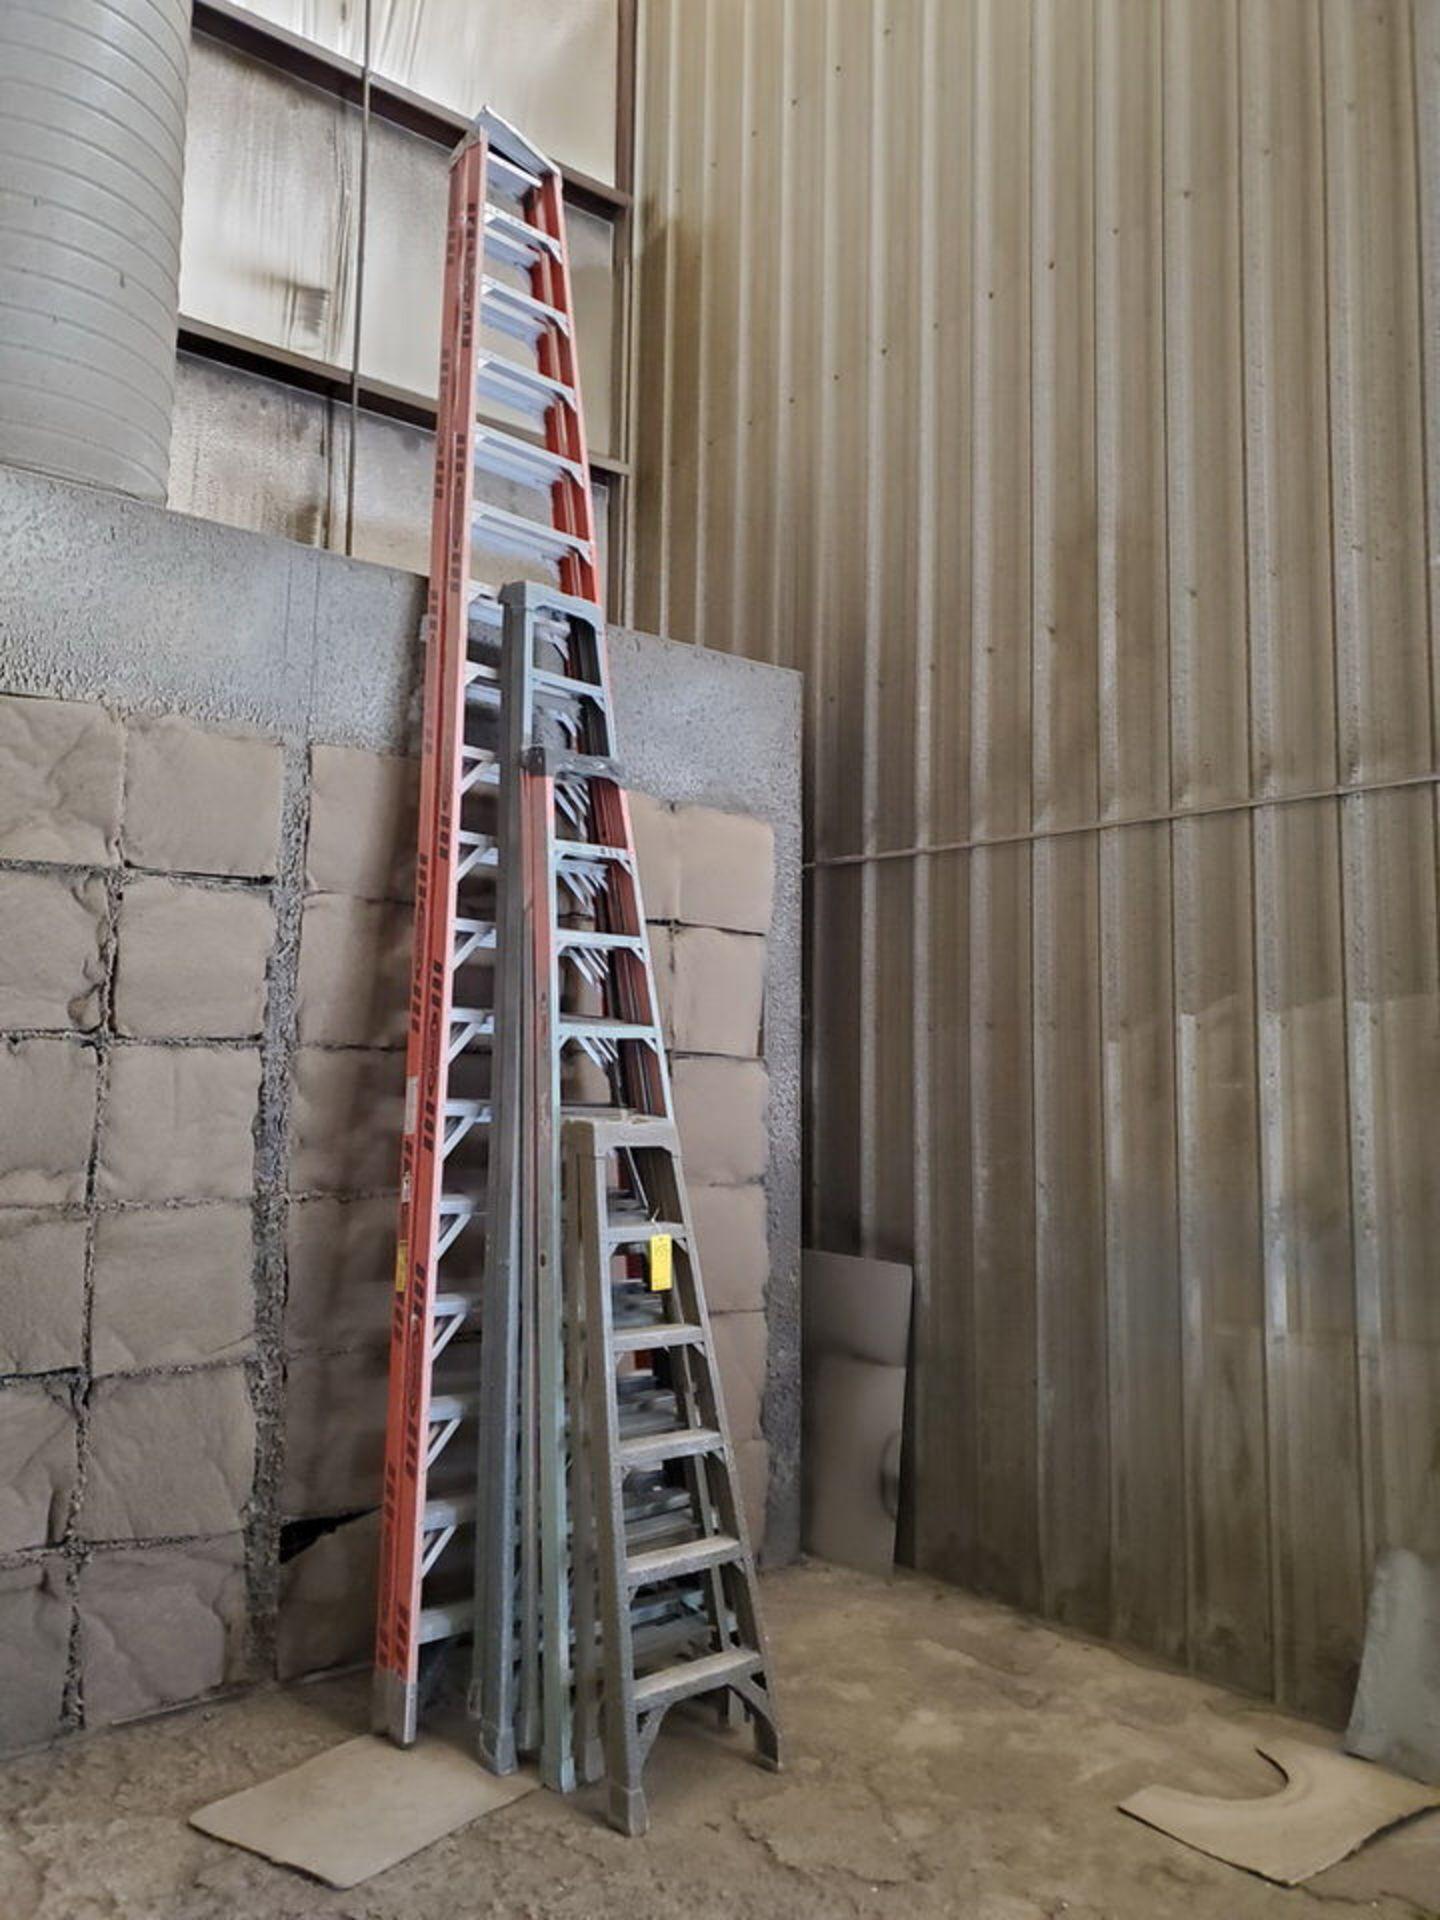 (4) Assorted Fiberglass Platform Ladders Sizes: 6', 10', 12', 18' - Image 2 of 3